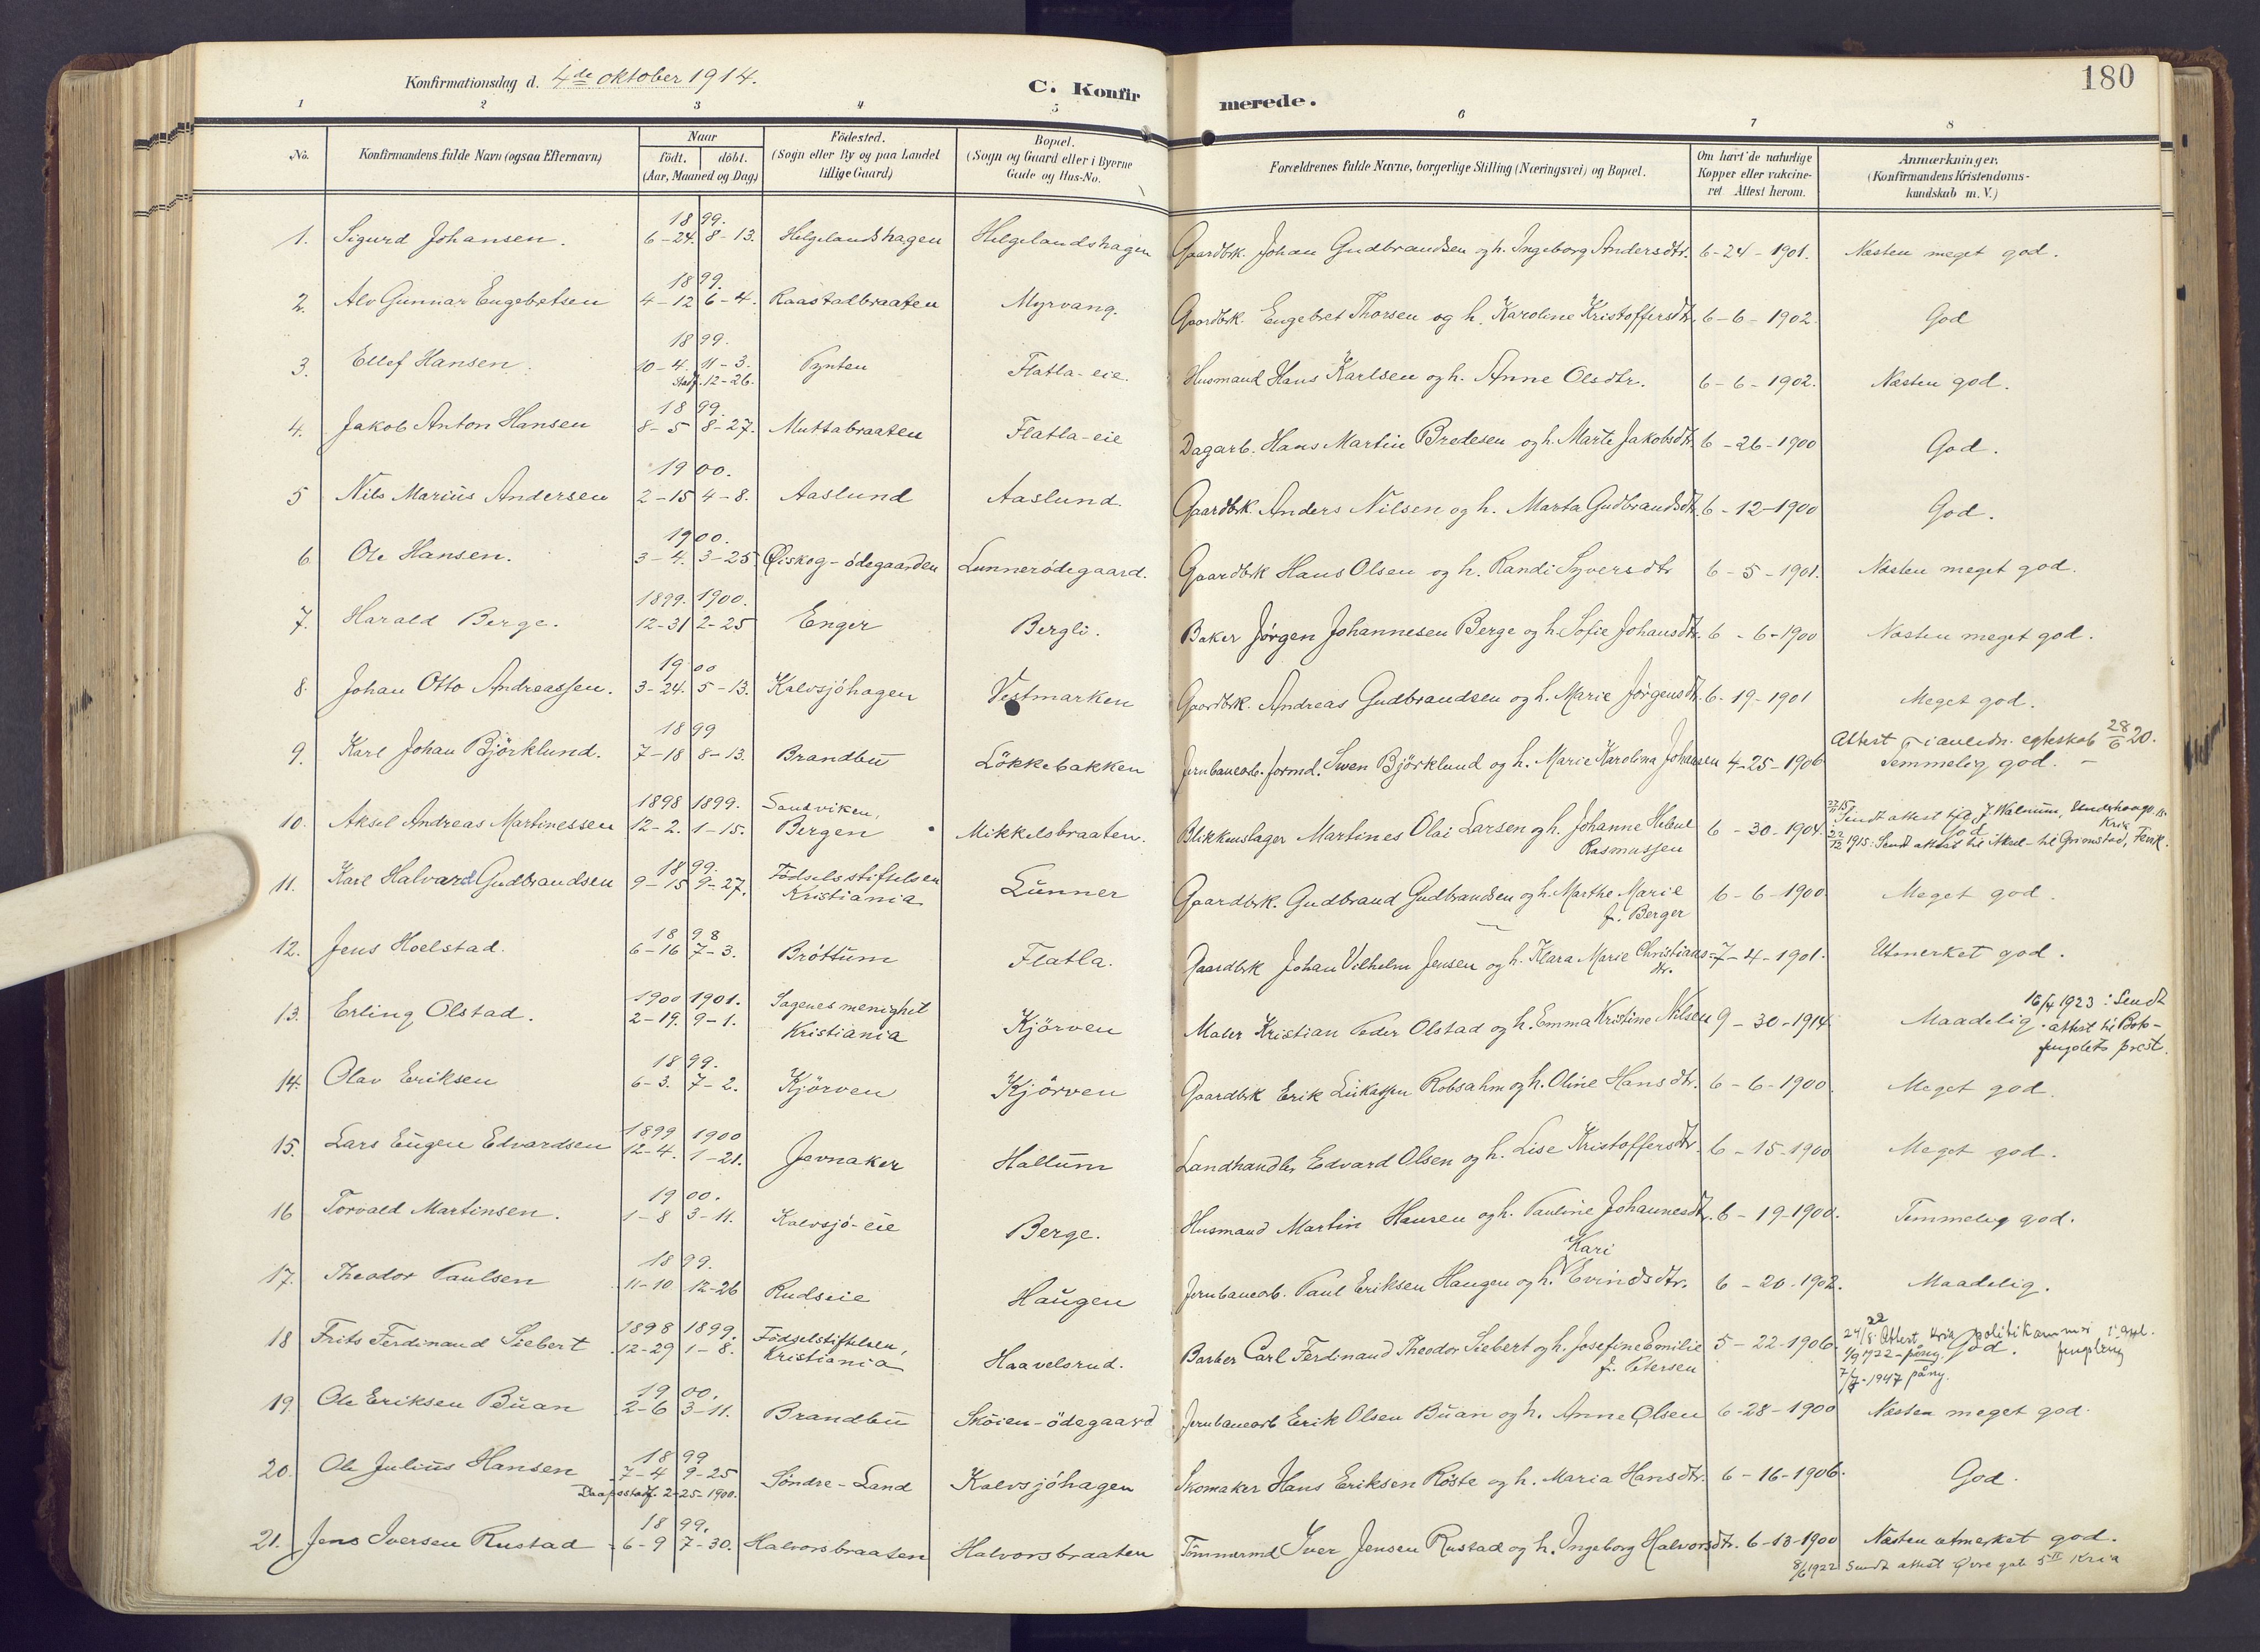 SAH, Lunner prestekontor, H/Ha/Haa/L0001: Ministerialbok nr. 1, 1907-1922, s. 180